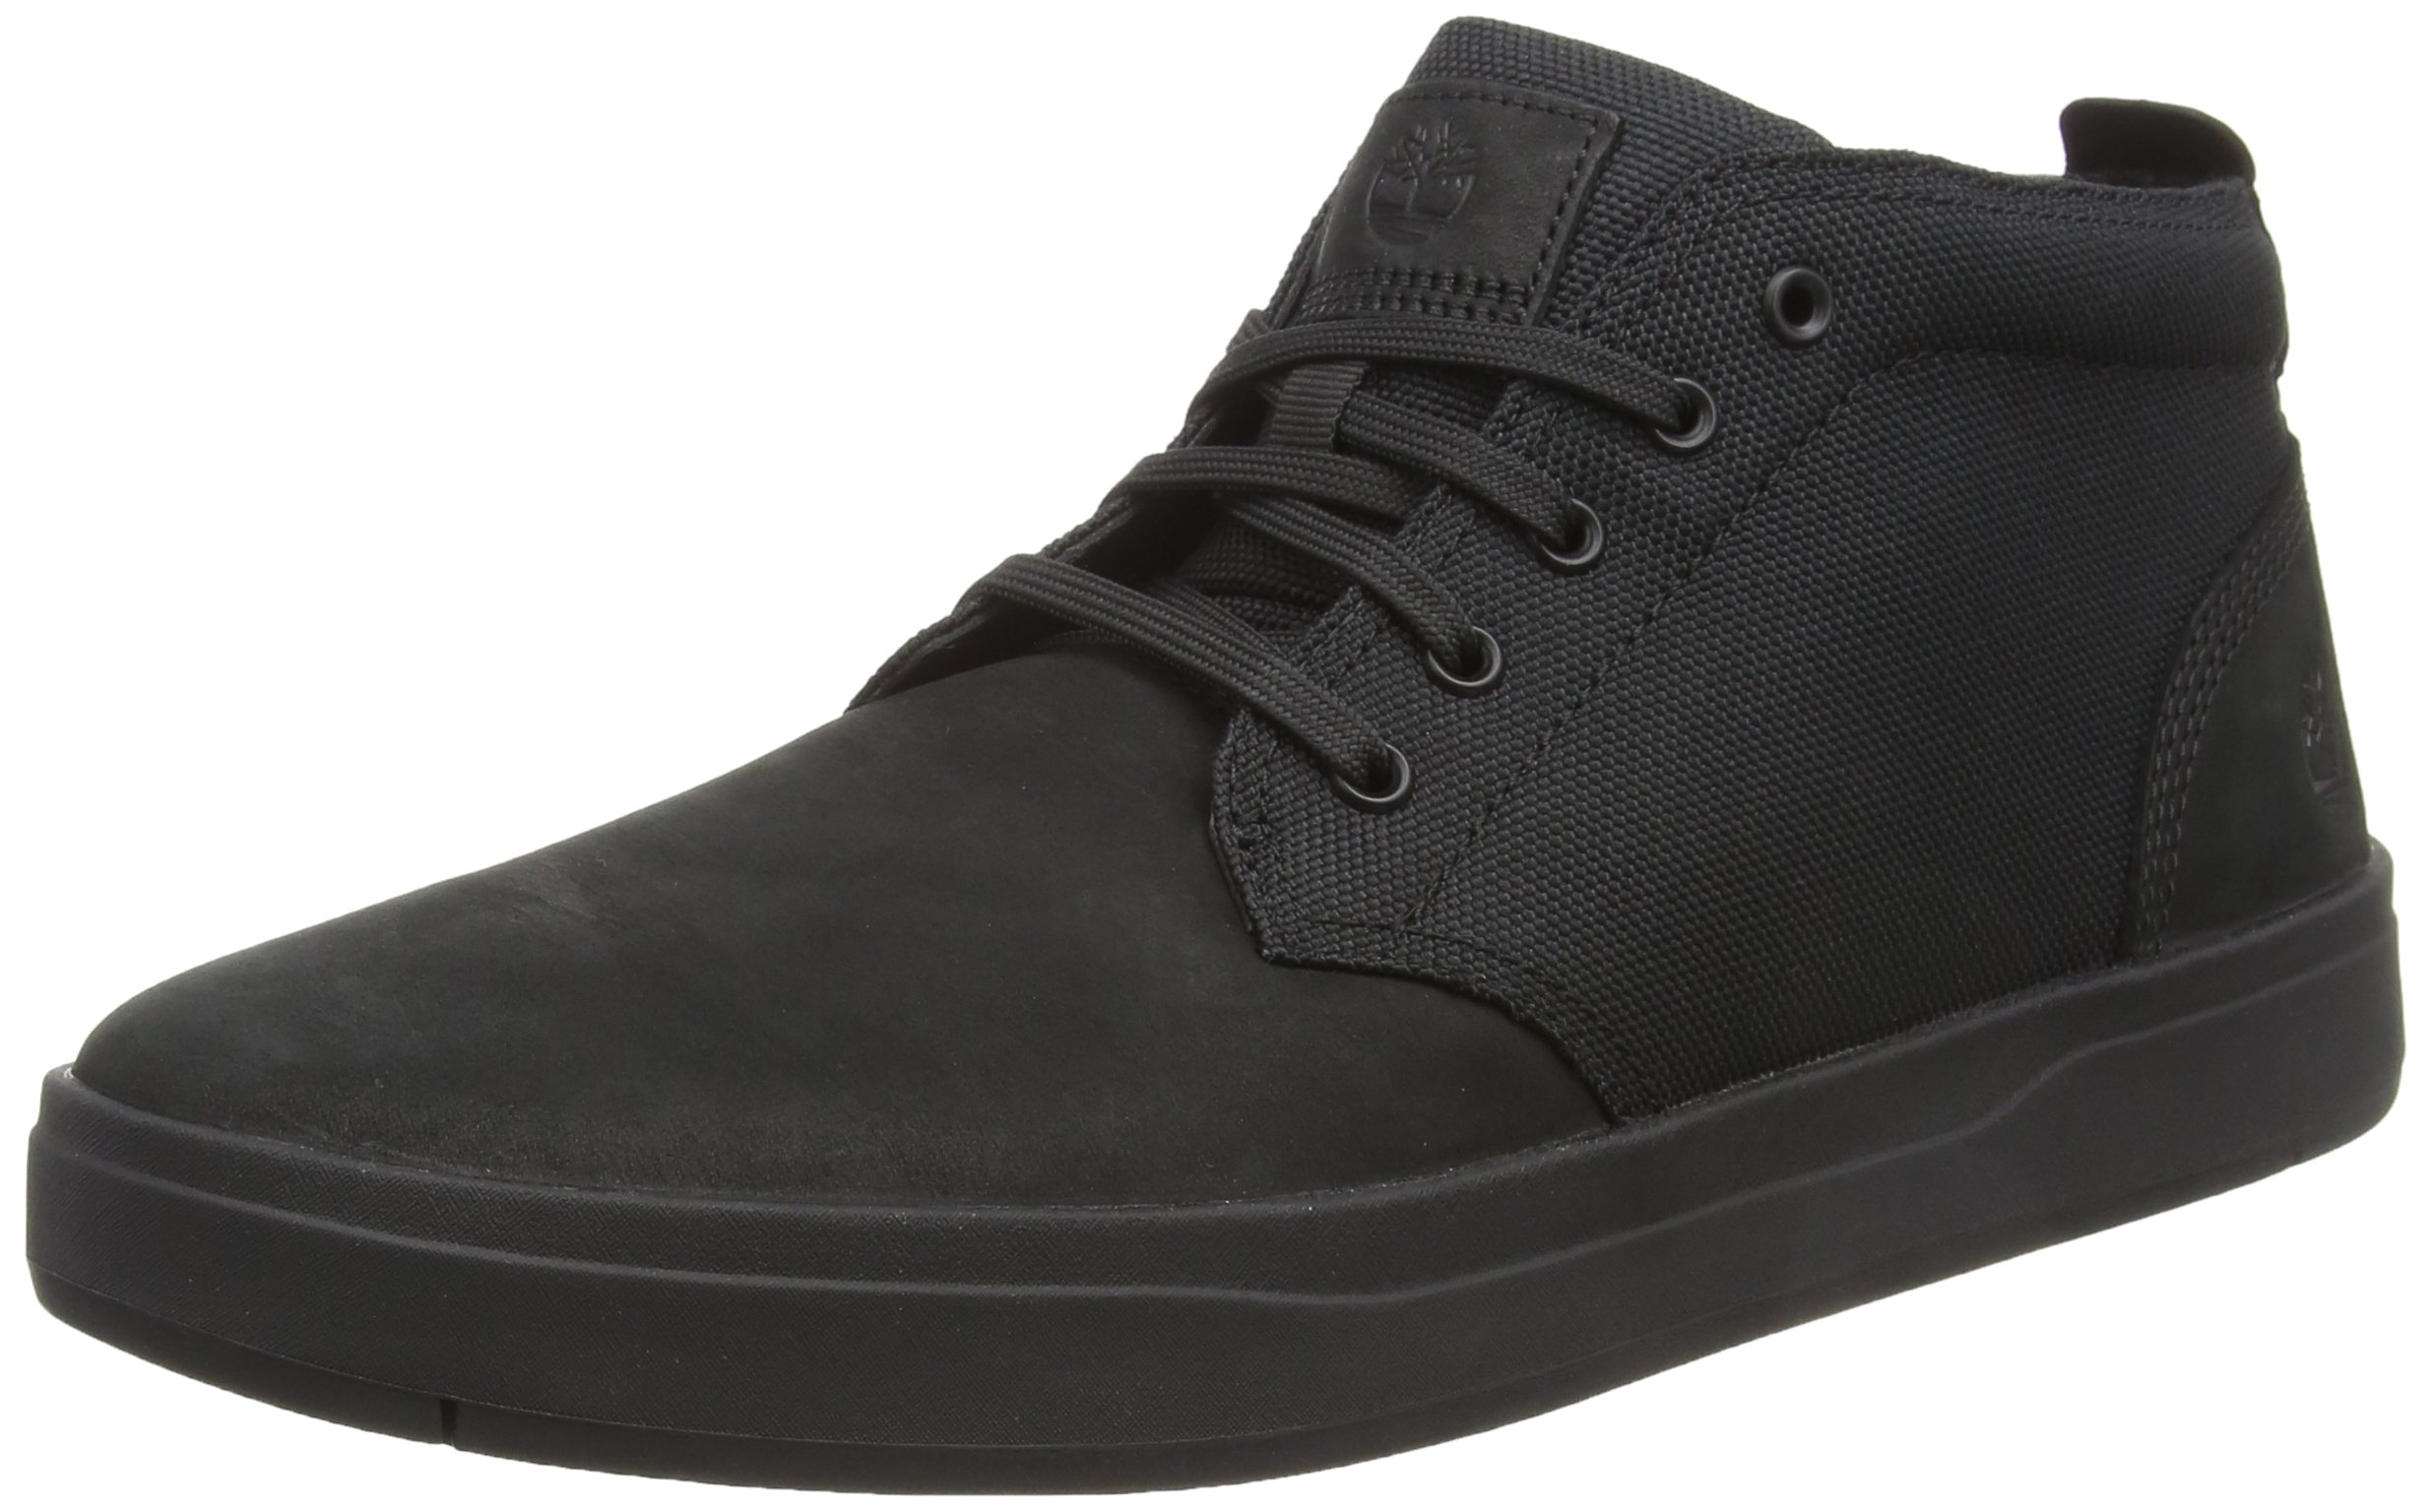 Timberland Mens Groveton Chukka Blackout Nubuck/Cordura Sneaker - 13